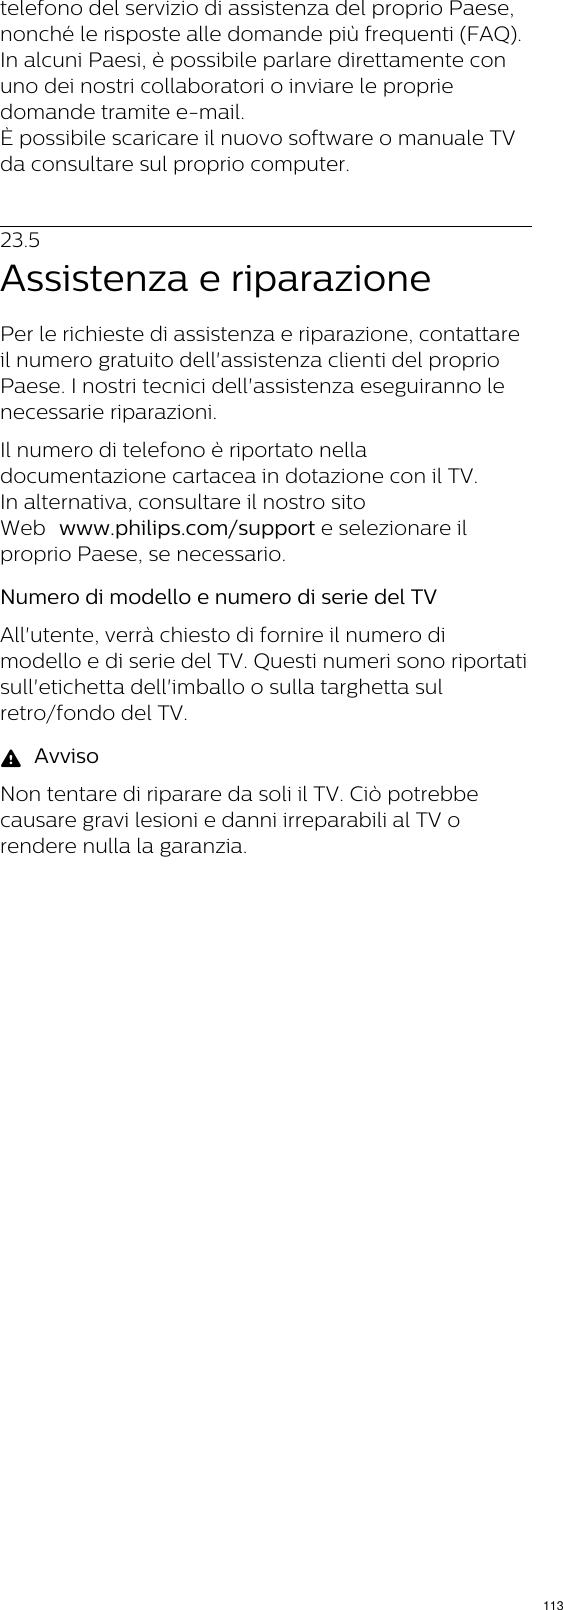 Assistenza Tv Philips.Philips 32pfs5501 12 User Manual Vartotojo Vadovas 32pfs5501